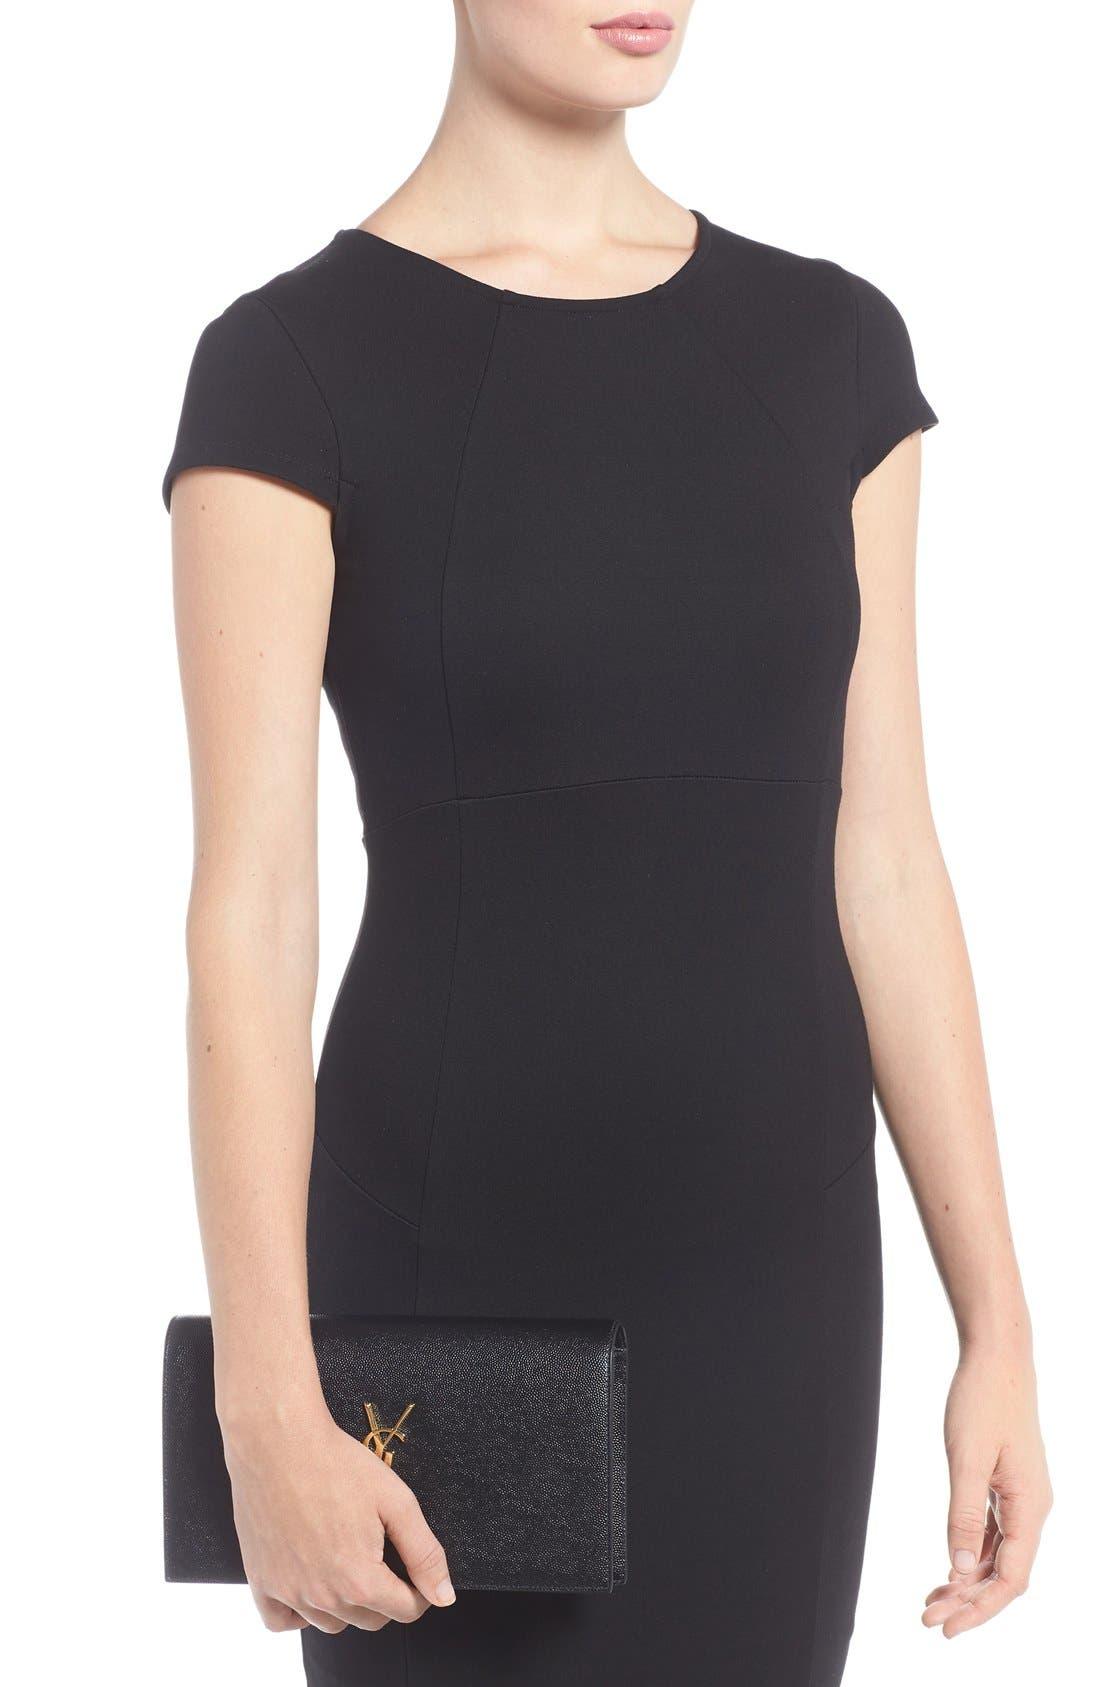 Saint Laurent Kate Monogram Ysl Leather Belt Bag Black